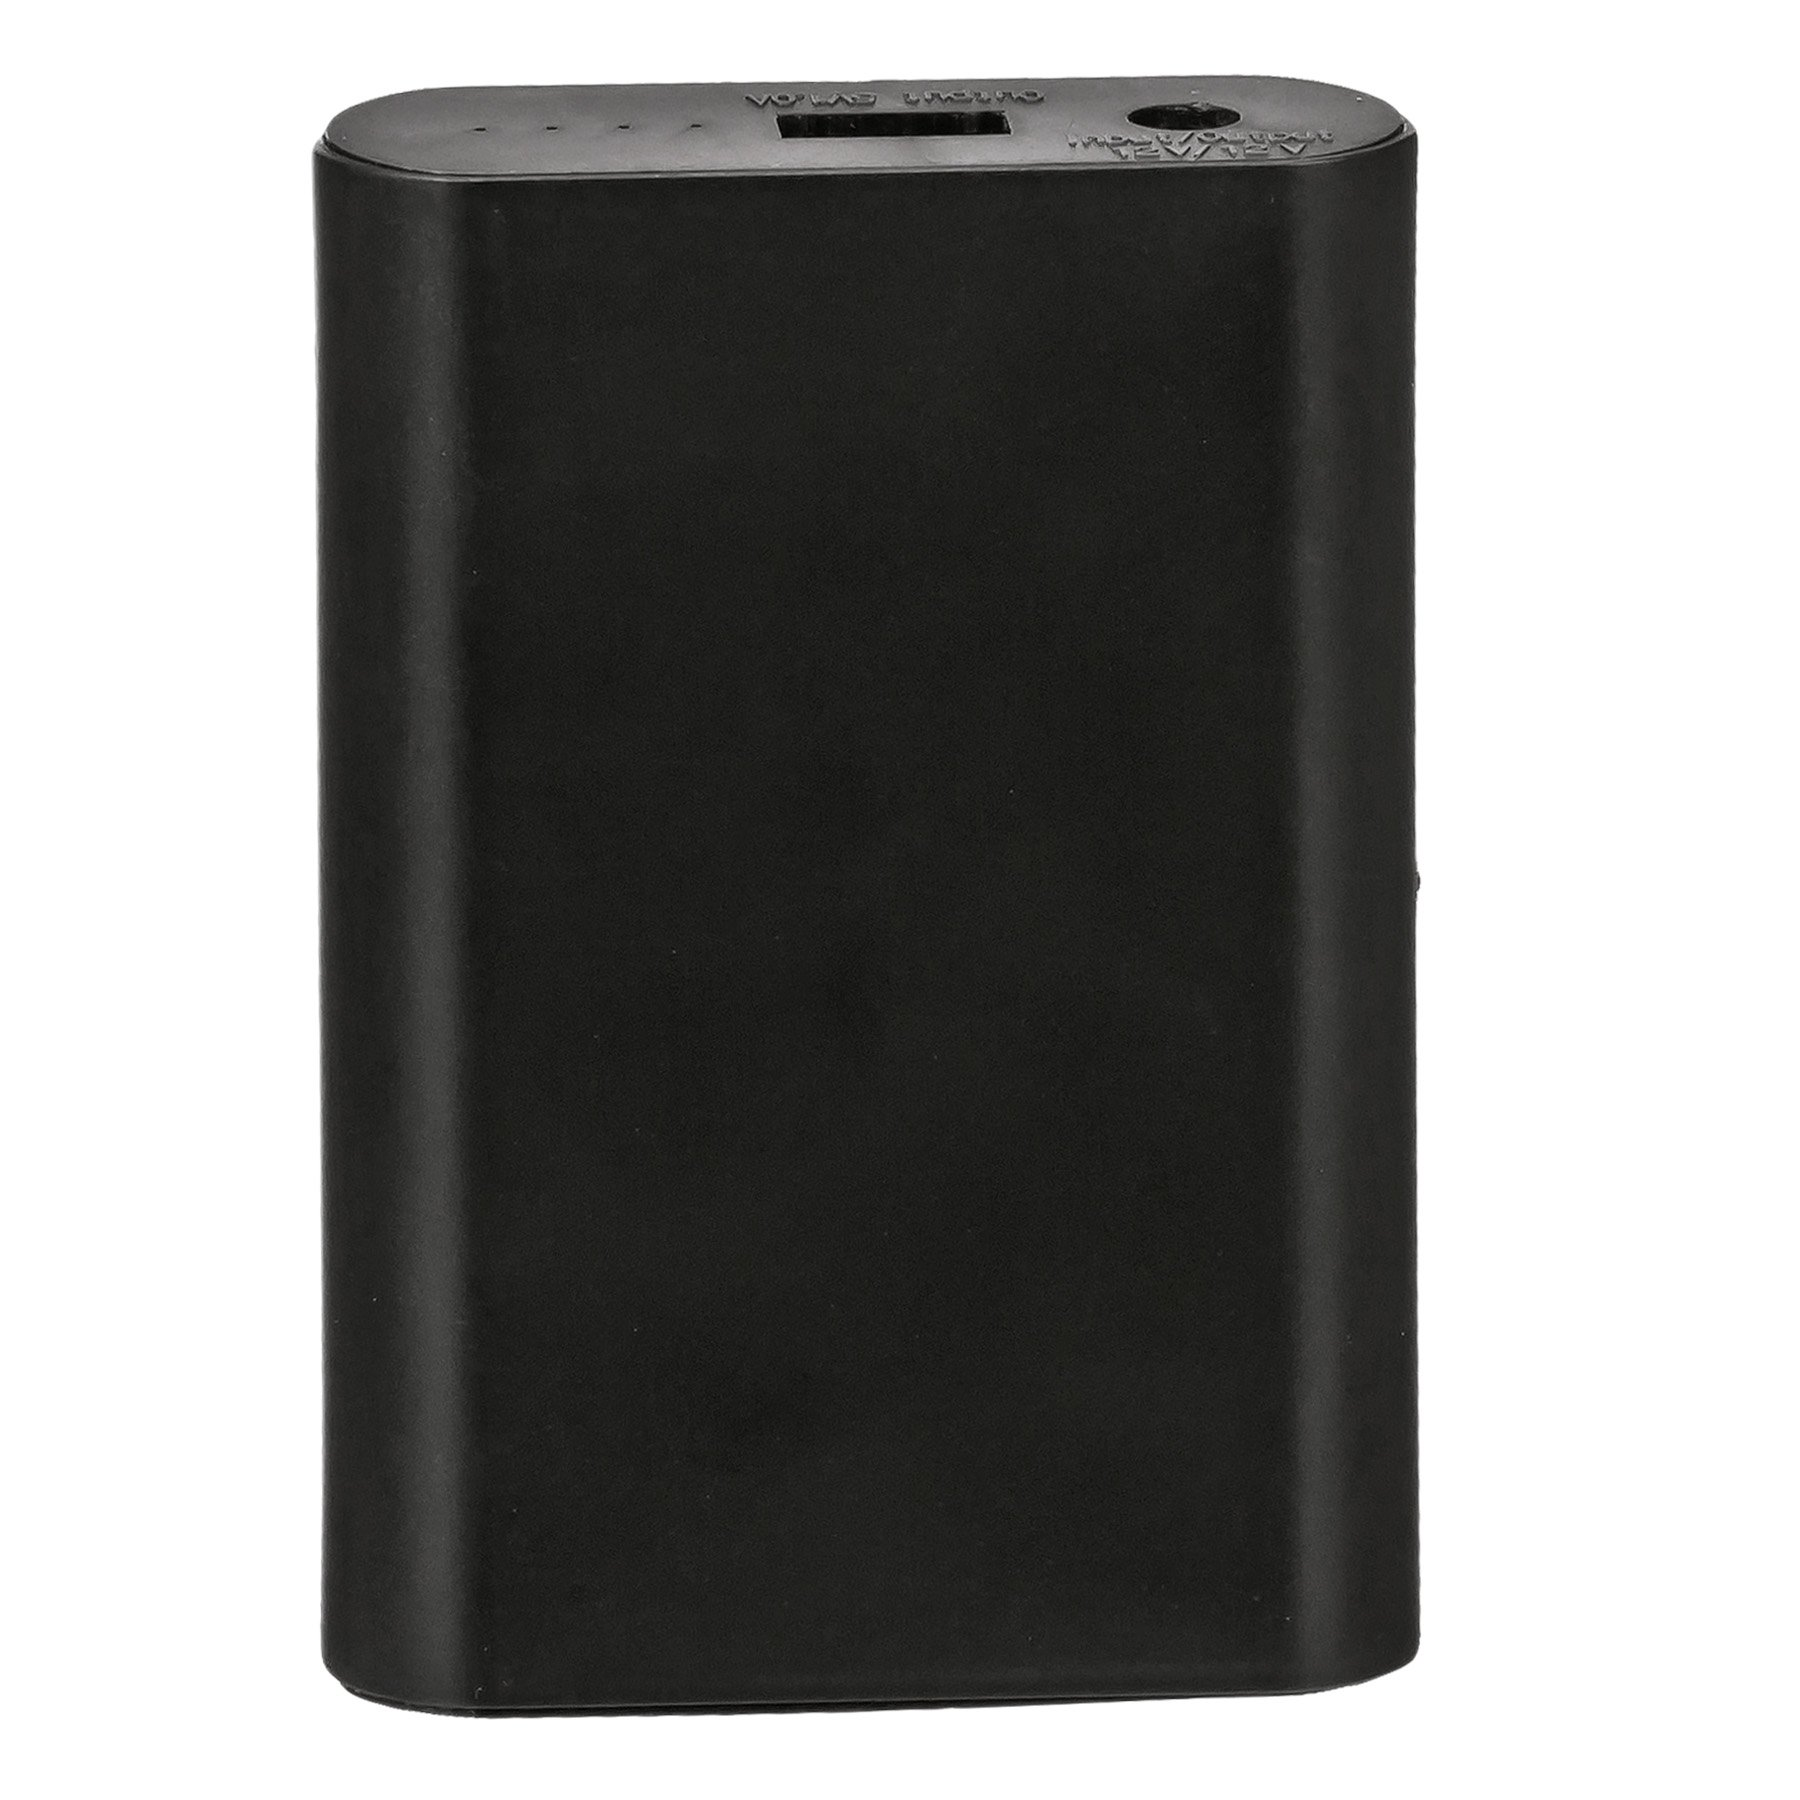 Chaheati Maxx 11.1 V Replacement Battery, Black